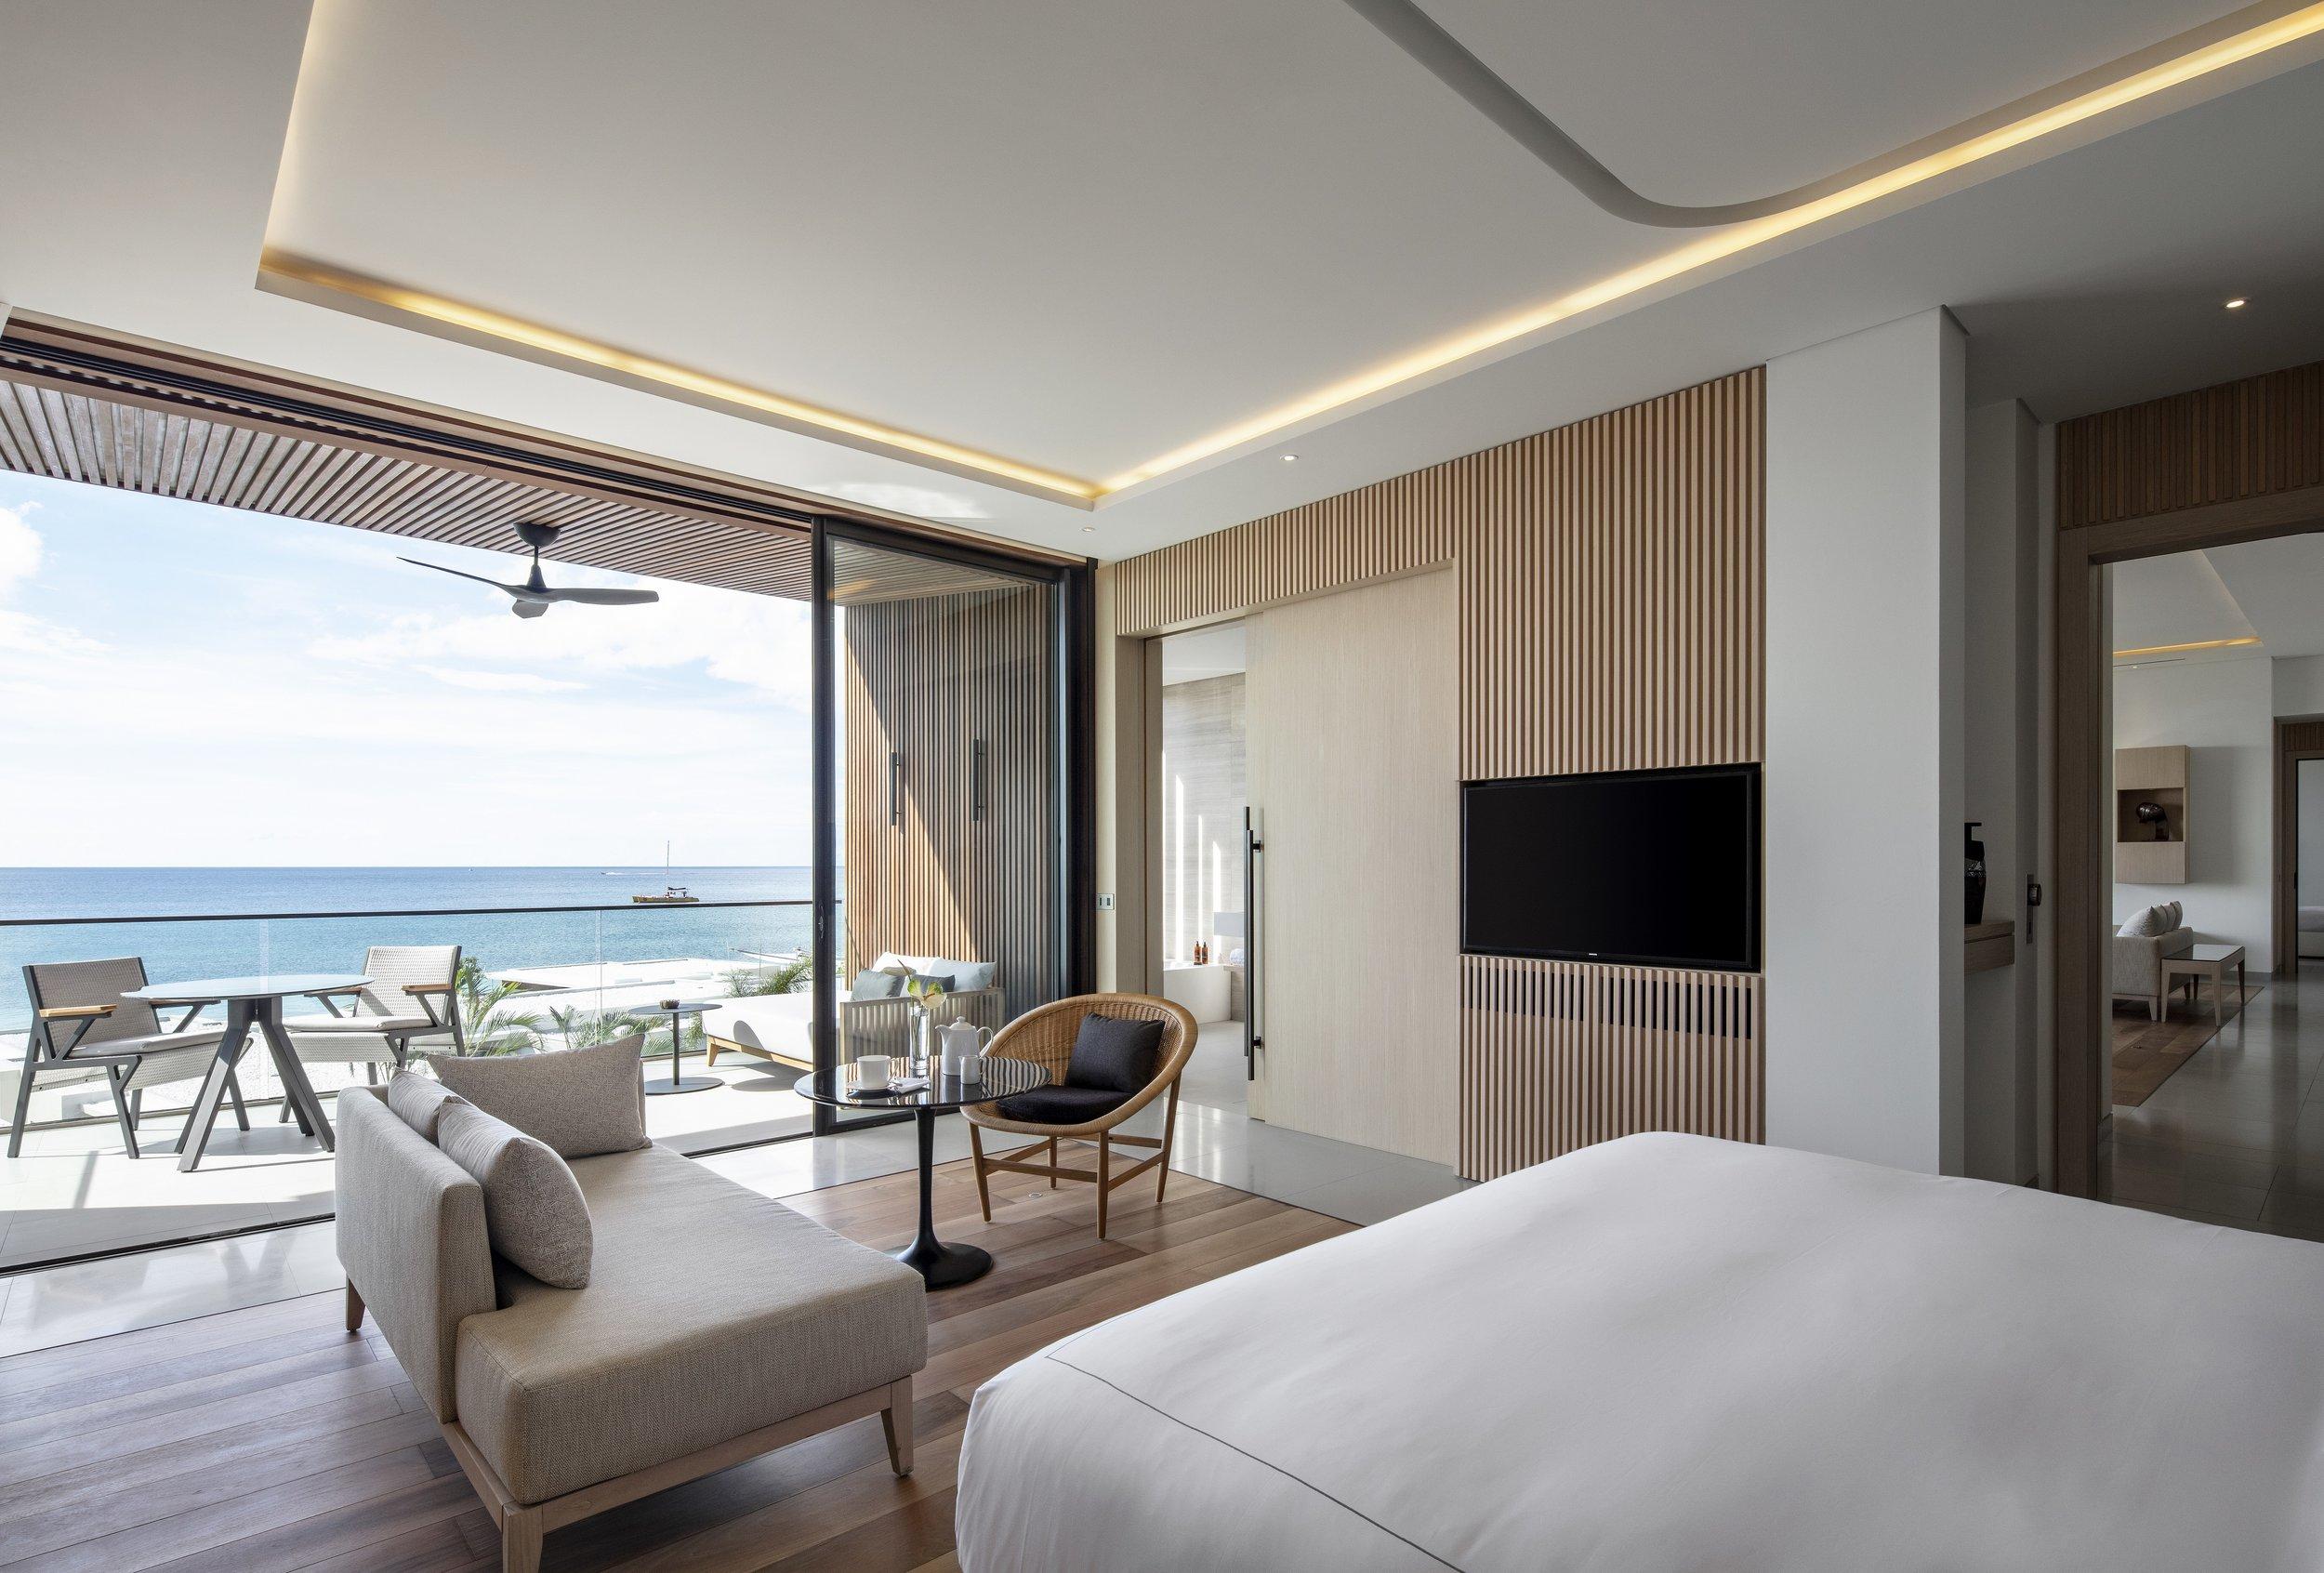 Penthouse Suite Master Bedroom.jpg